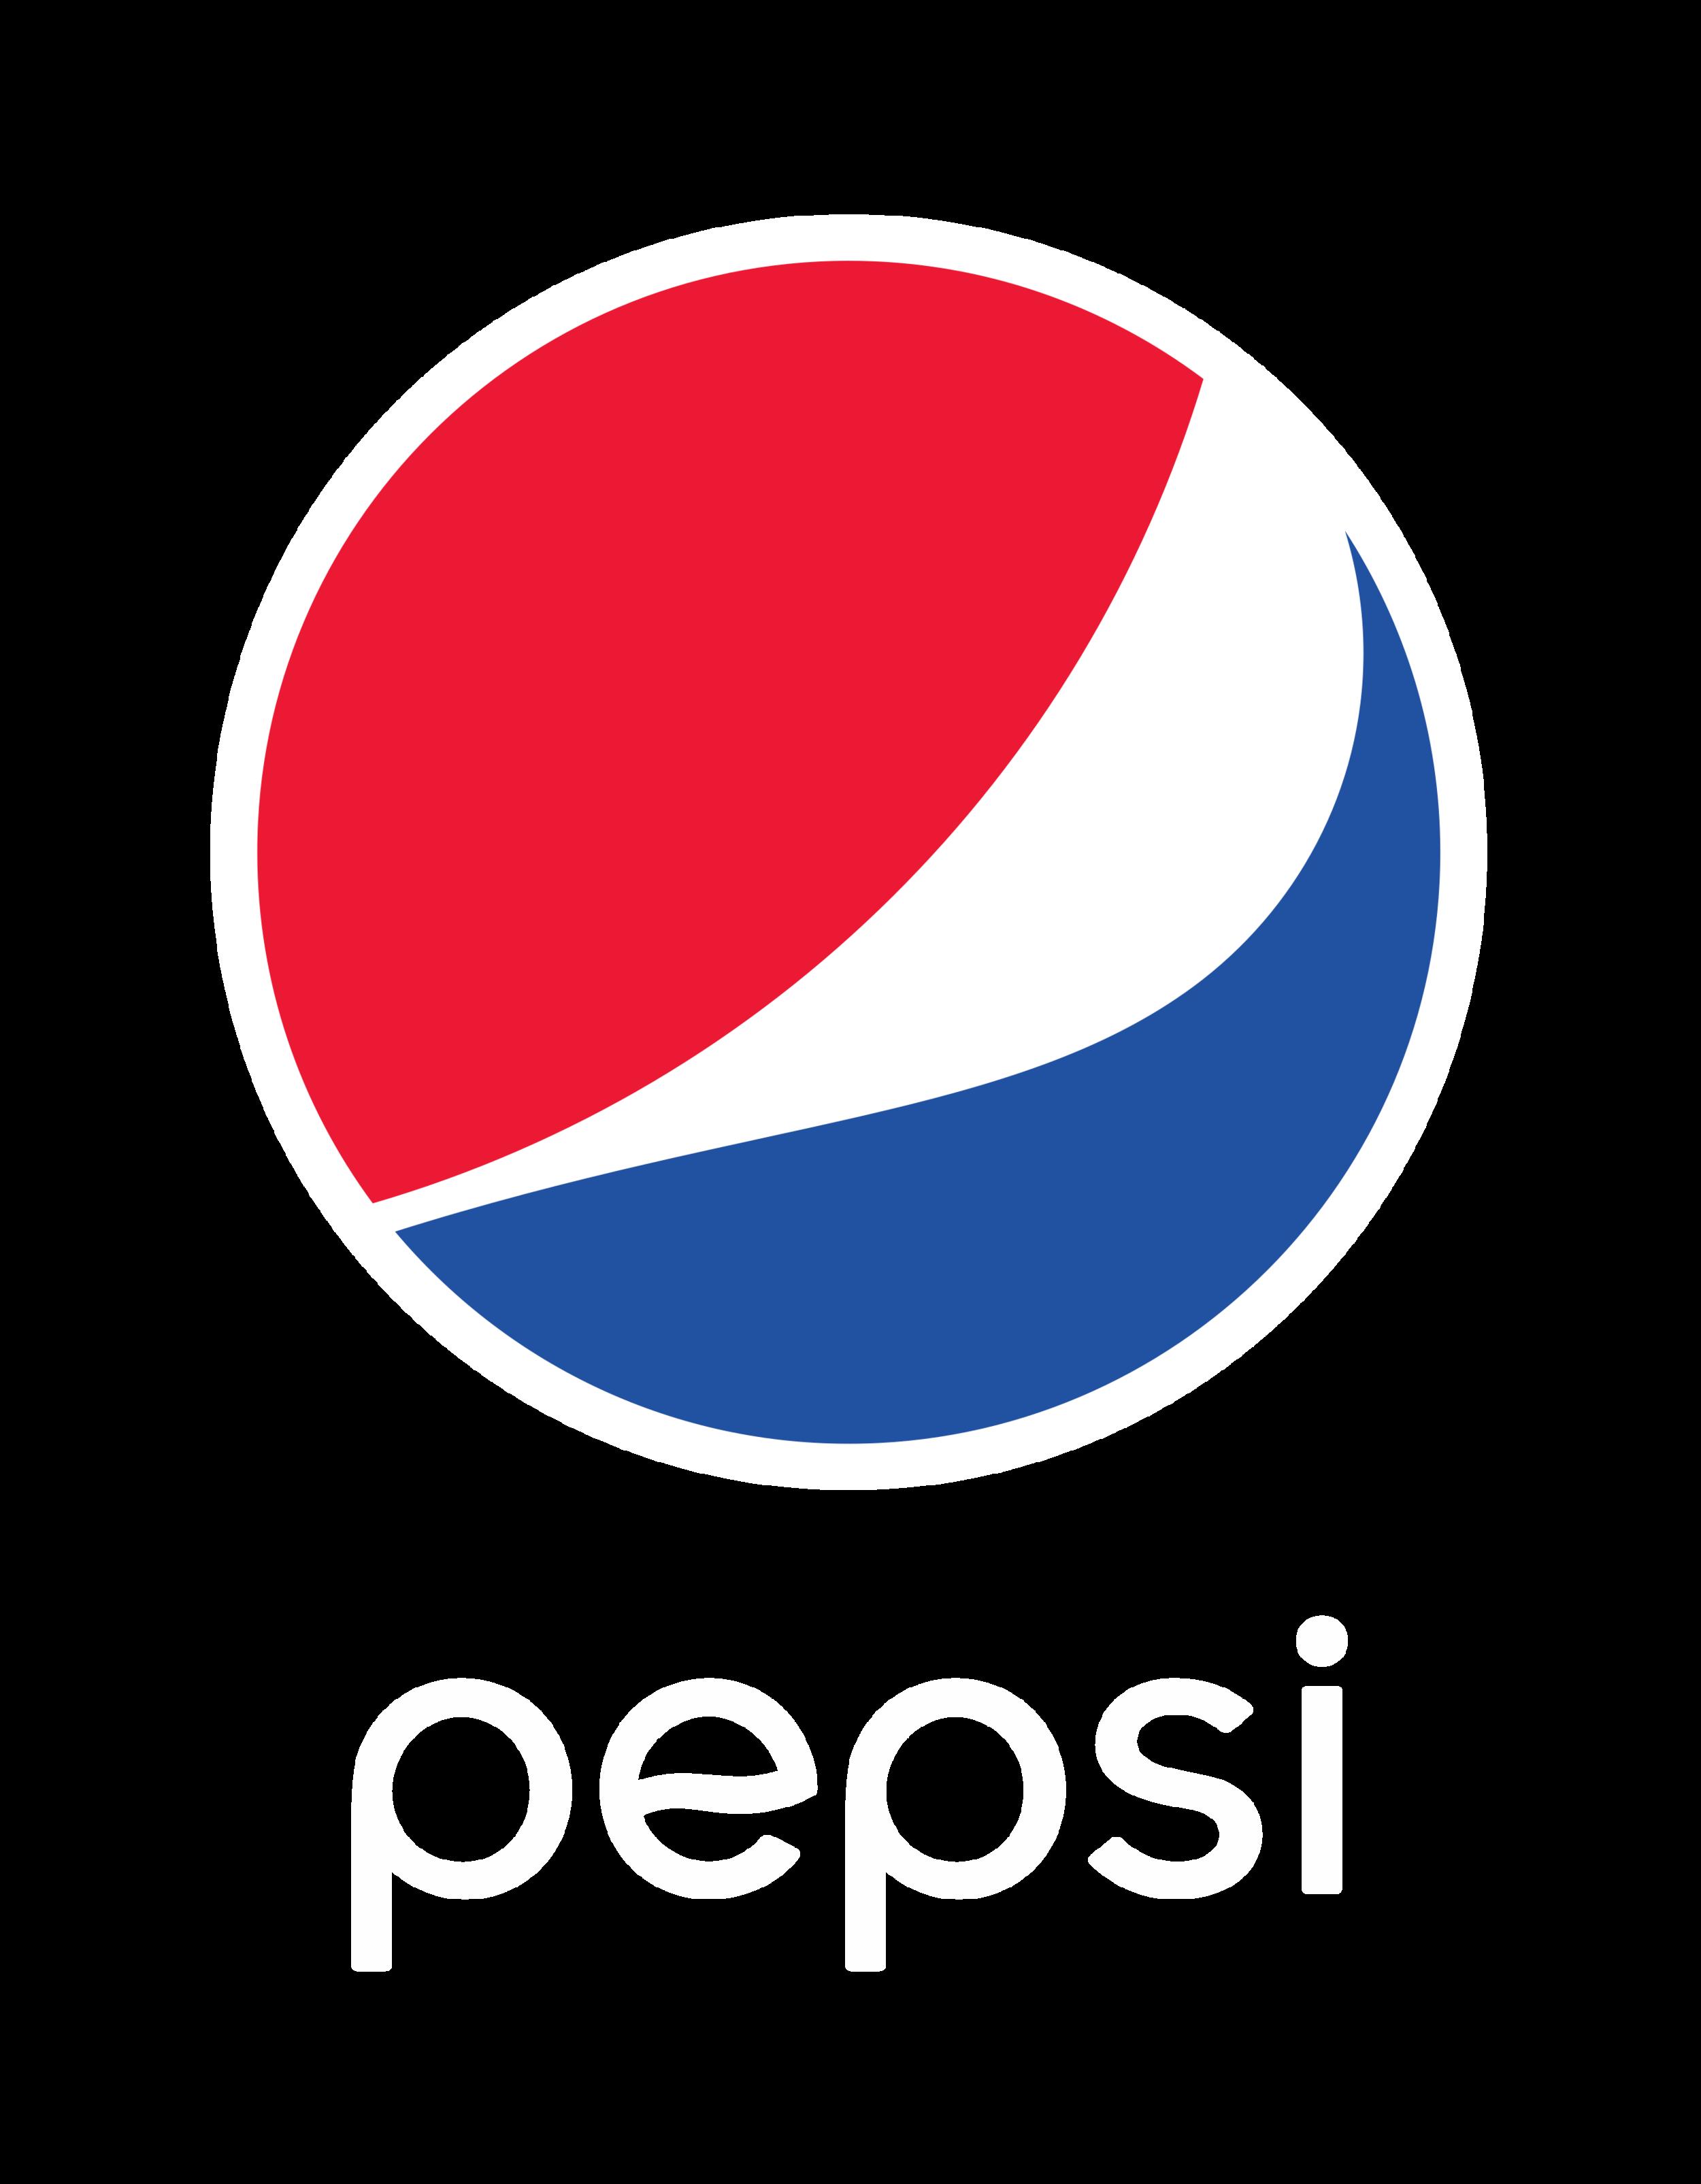 38.1 Pepsi_logo_REVERSED_alt••.png